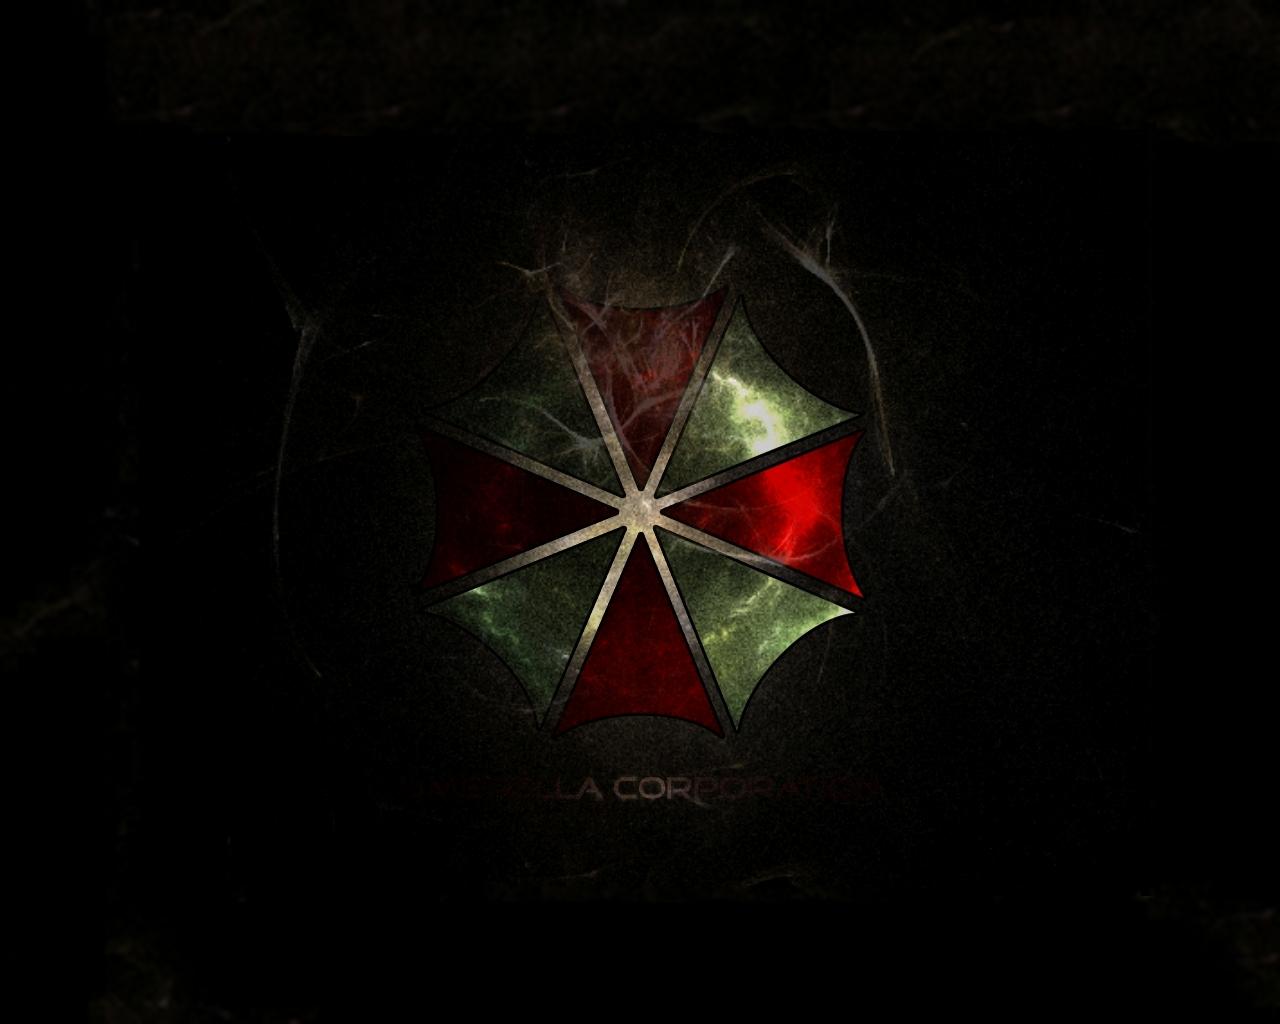 Katekyo Hitman Reborn Hd Wallpaper Resident Evil Backgrounds Hd Desktop Wallpapers 4k Hd